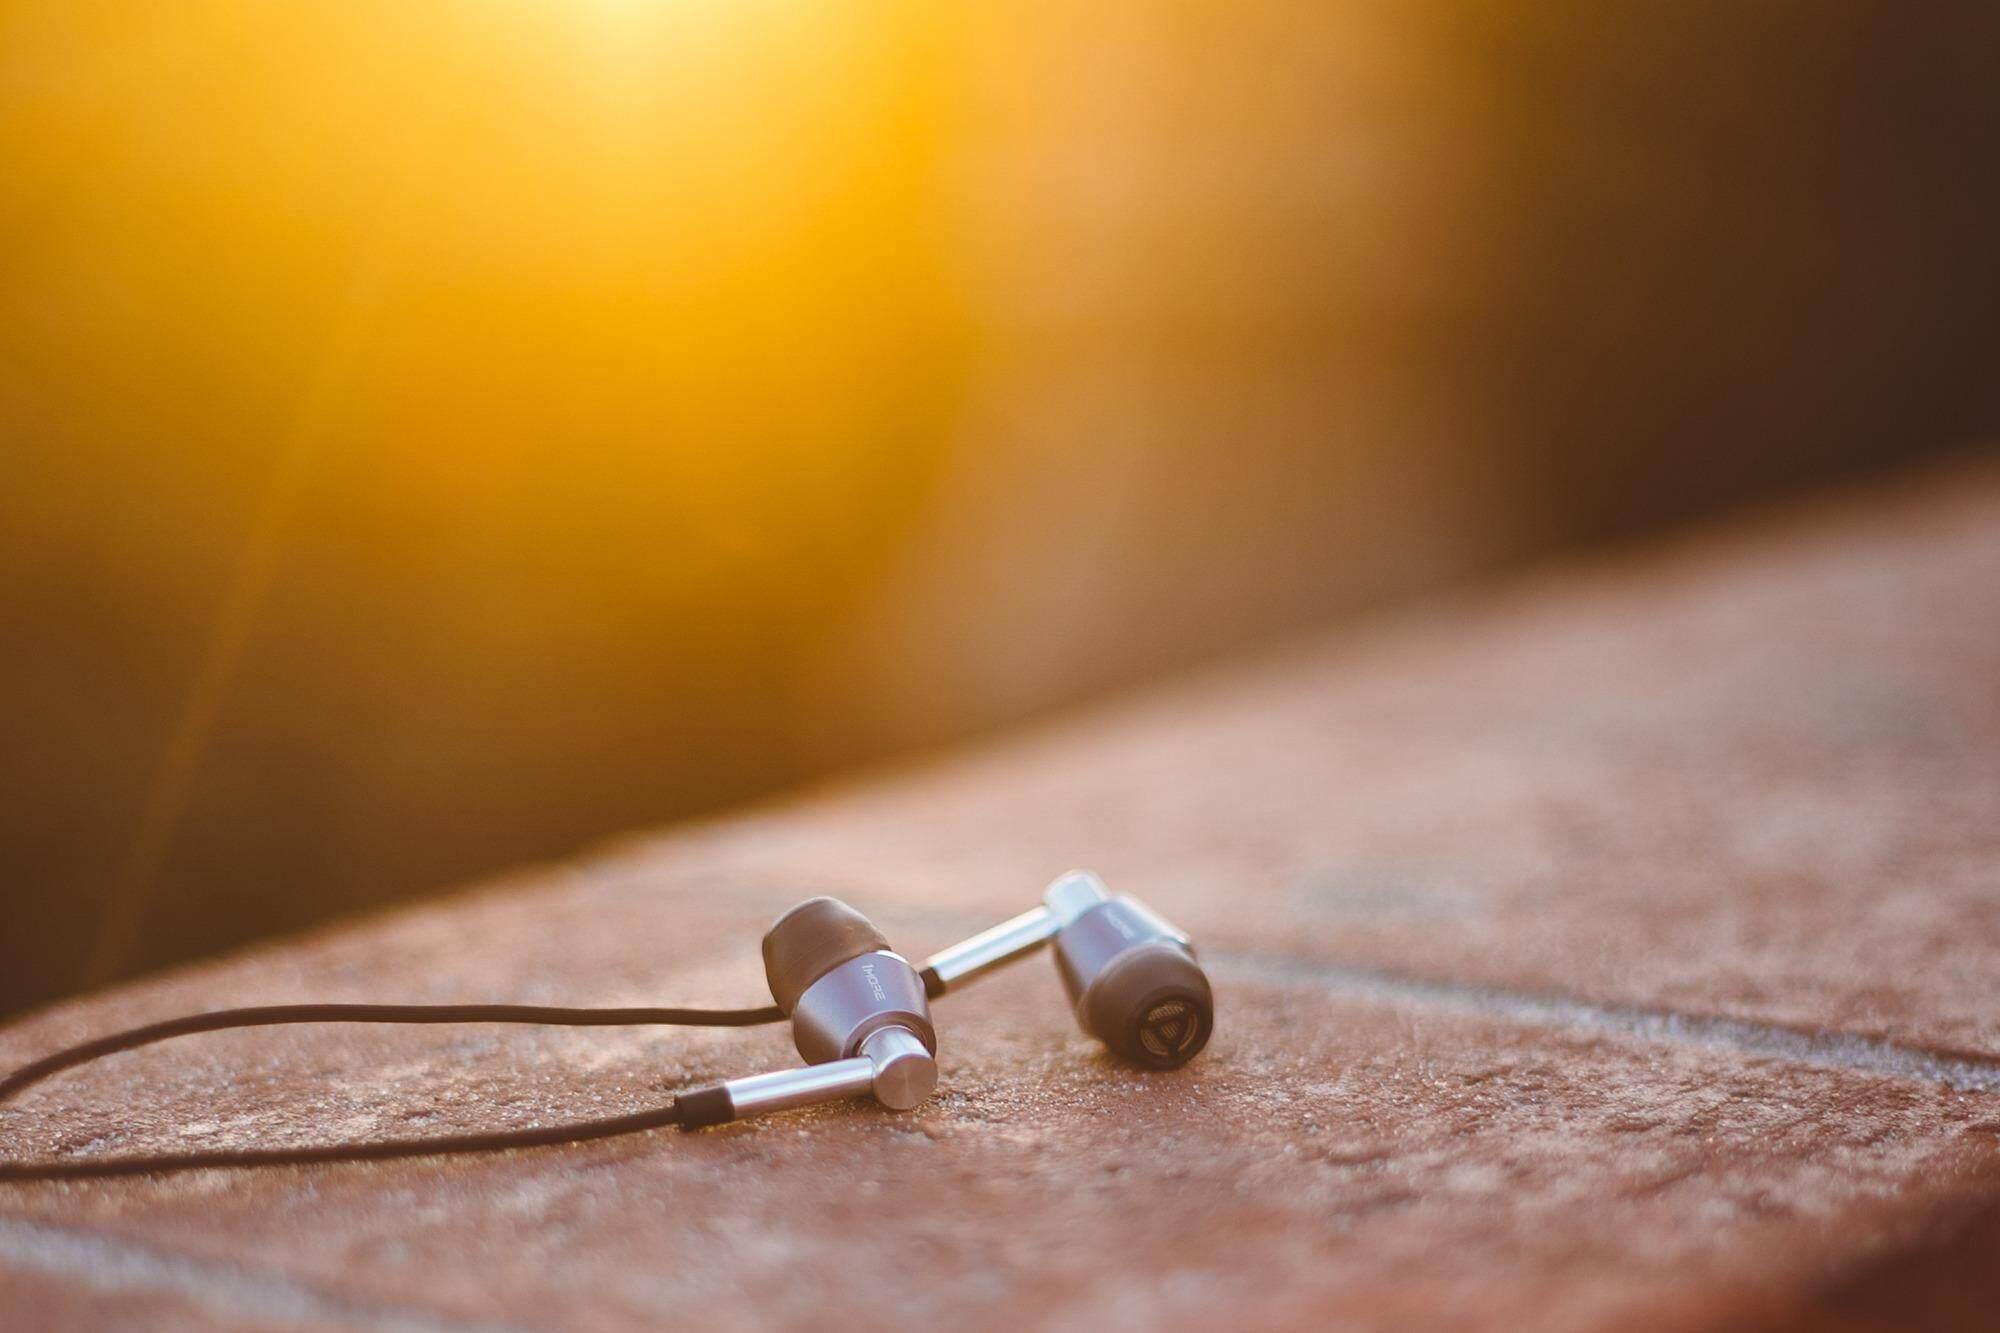 1MORE Triple Driver In-Ear Headphones (E1001) 5